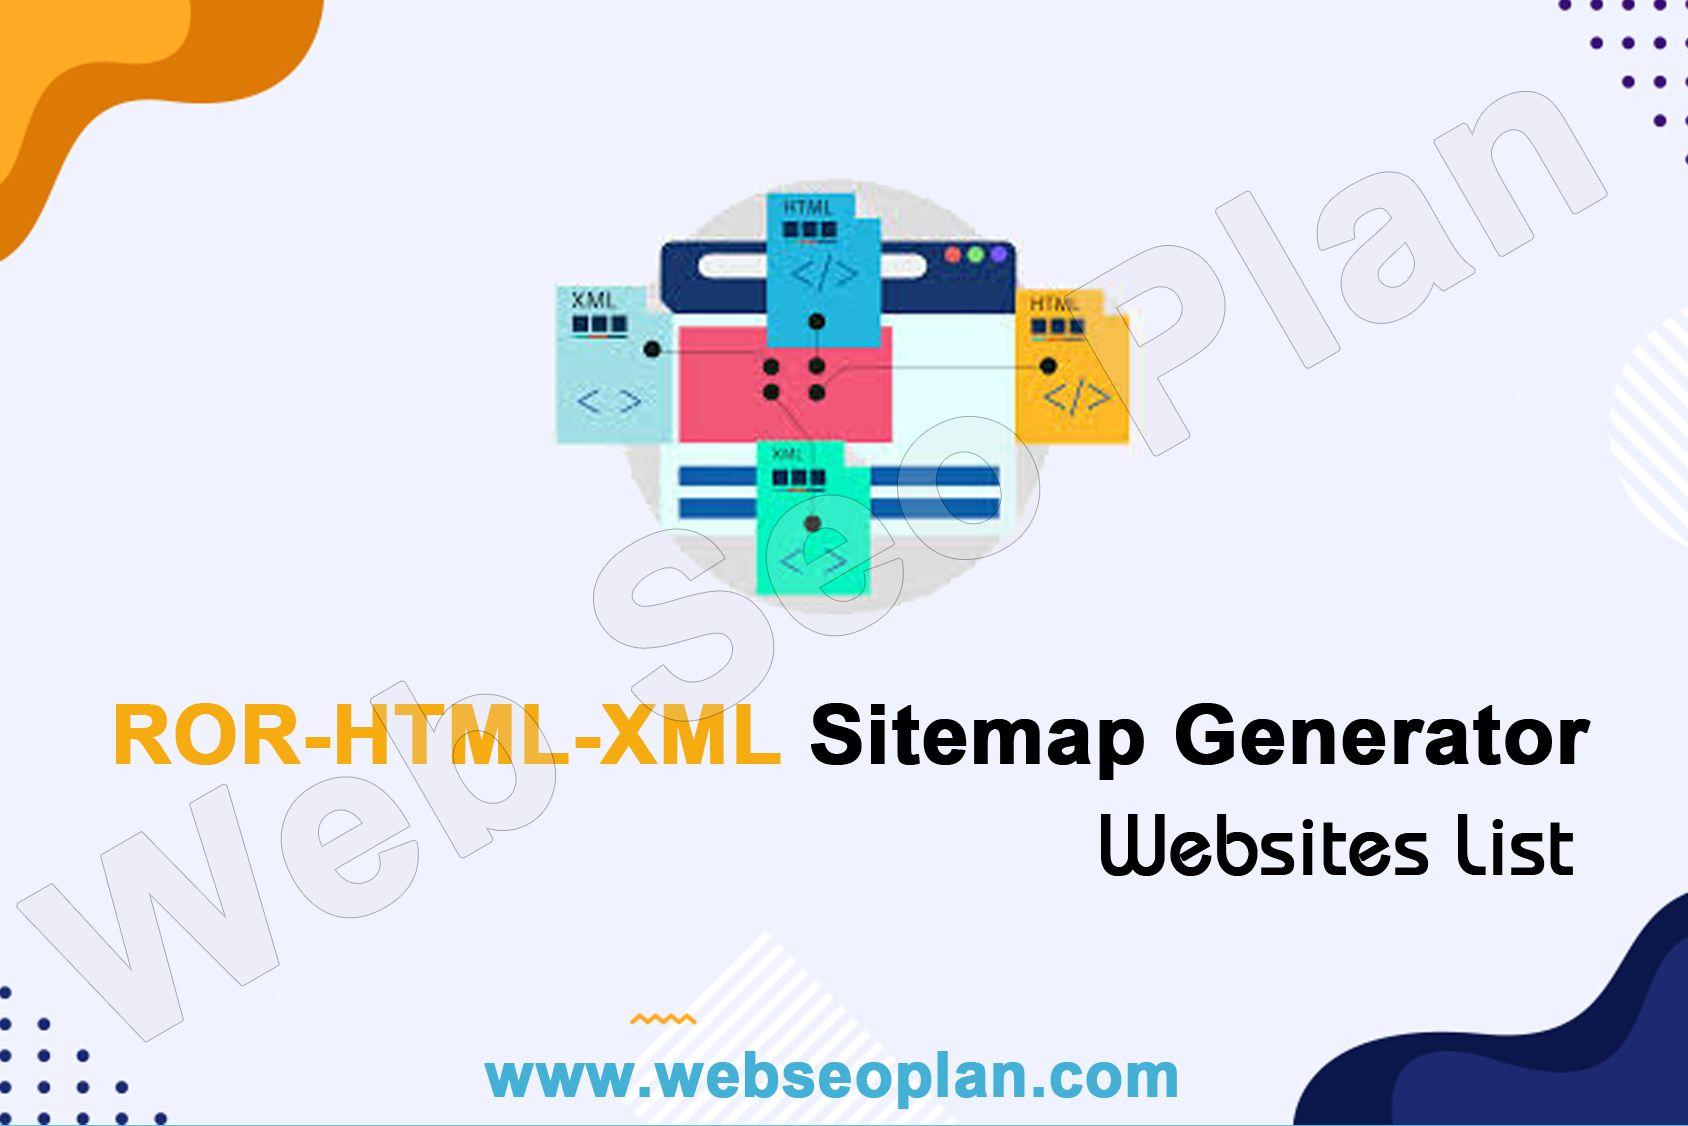 ROR-HTML-XML Sitemap Generator Tool